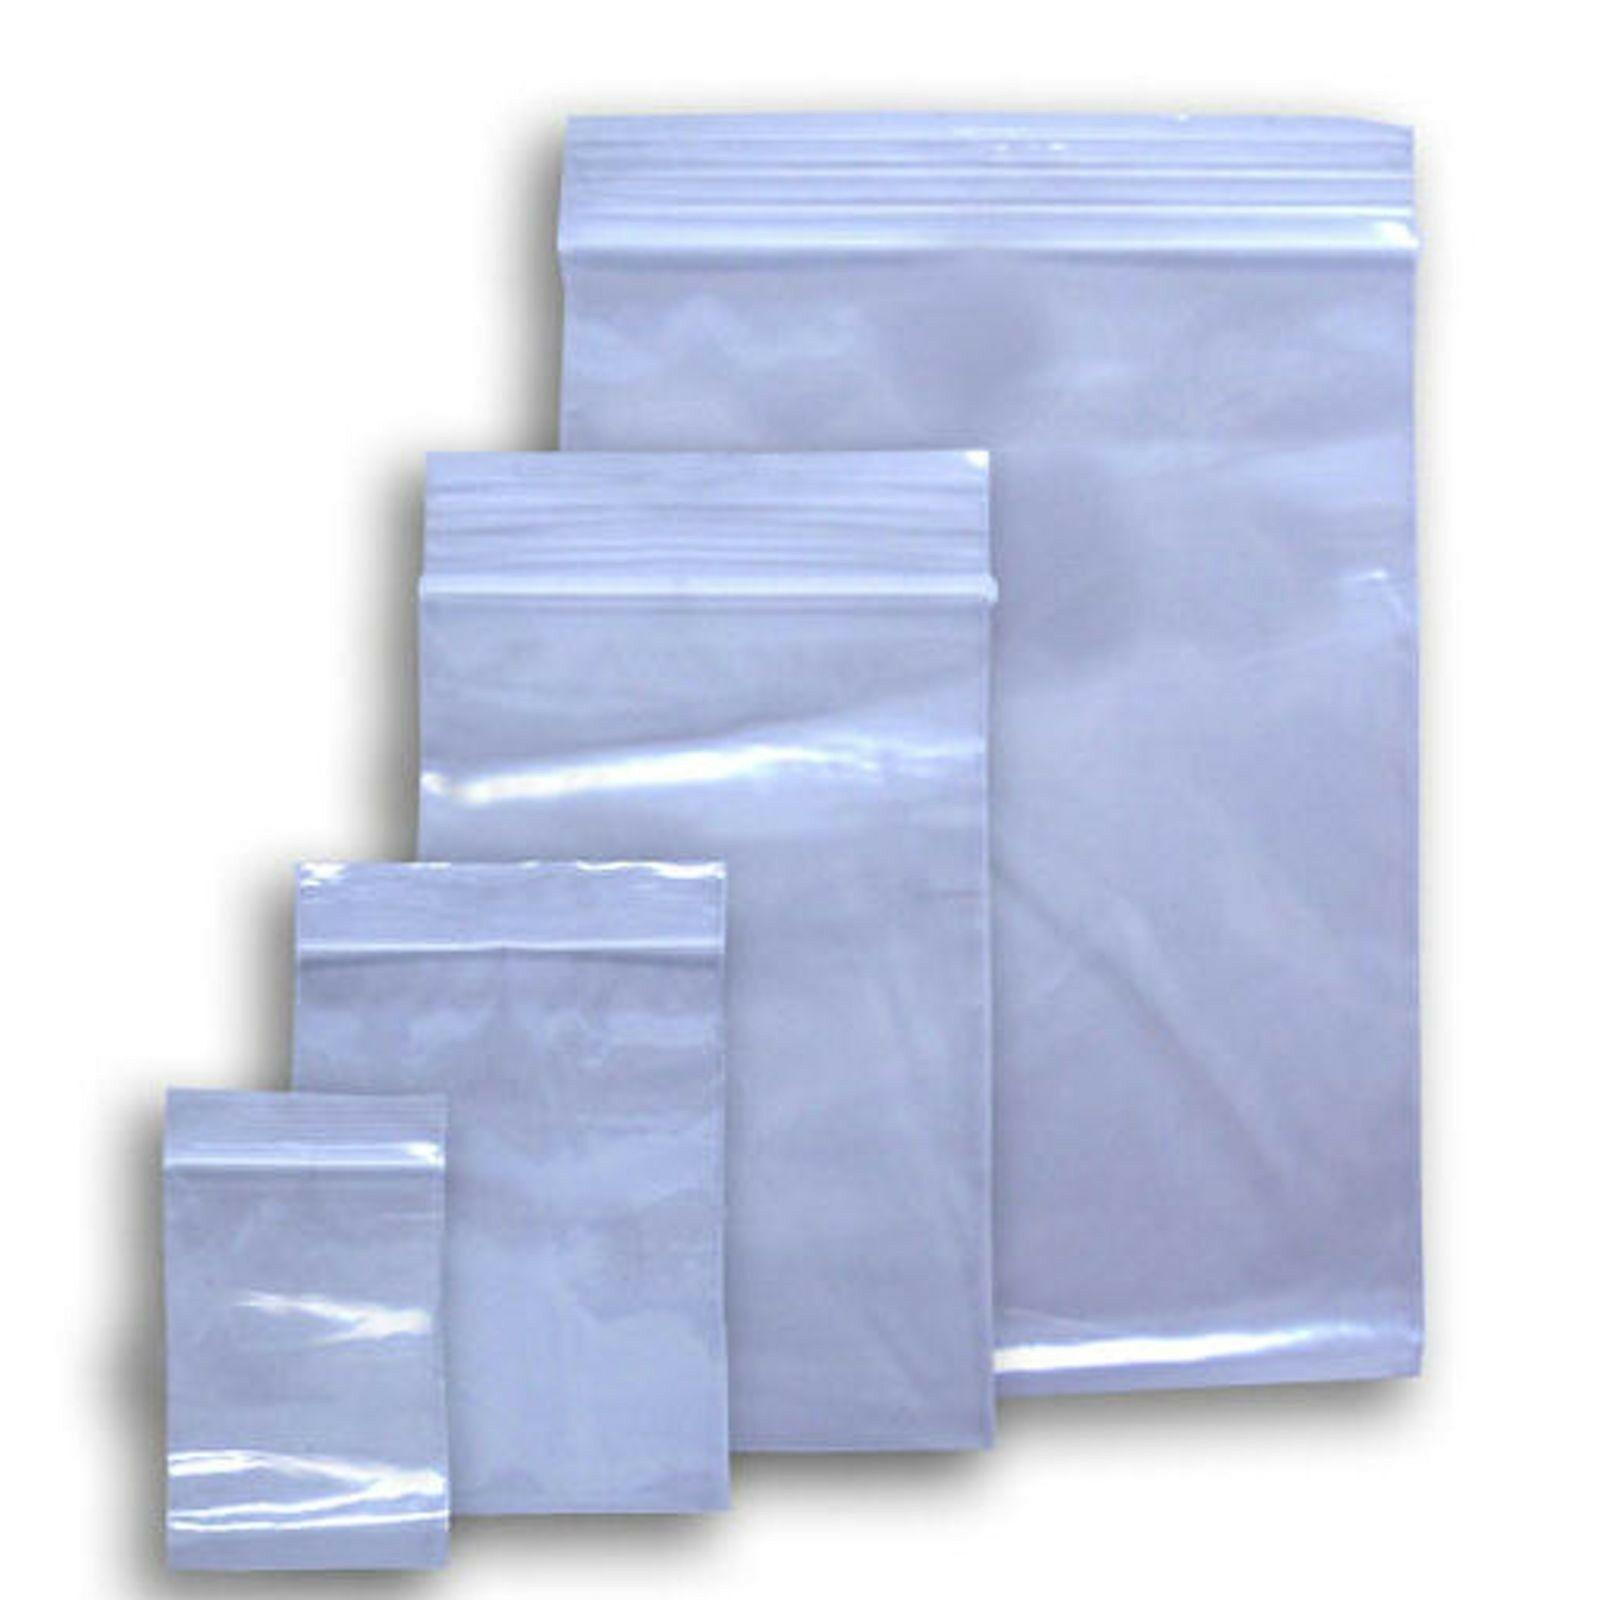 "Reclosable Poly Bag - 6"" x 6"" -2 mil"